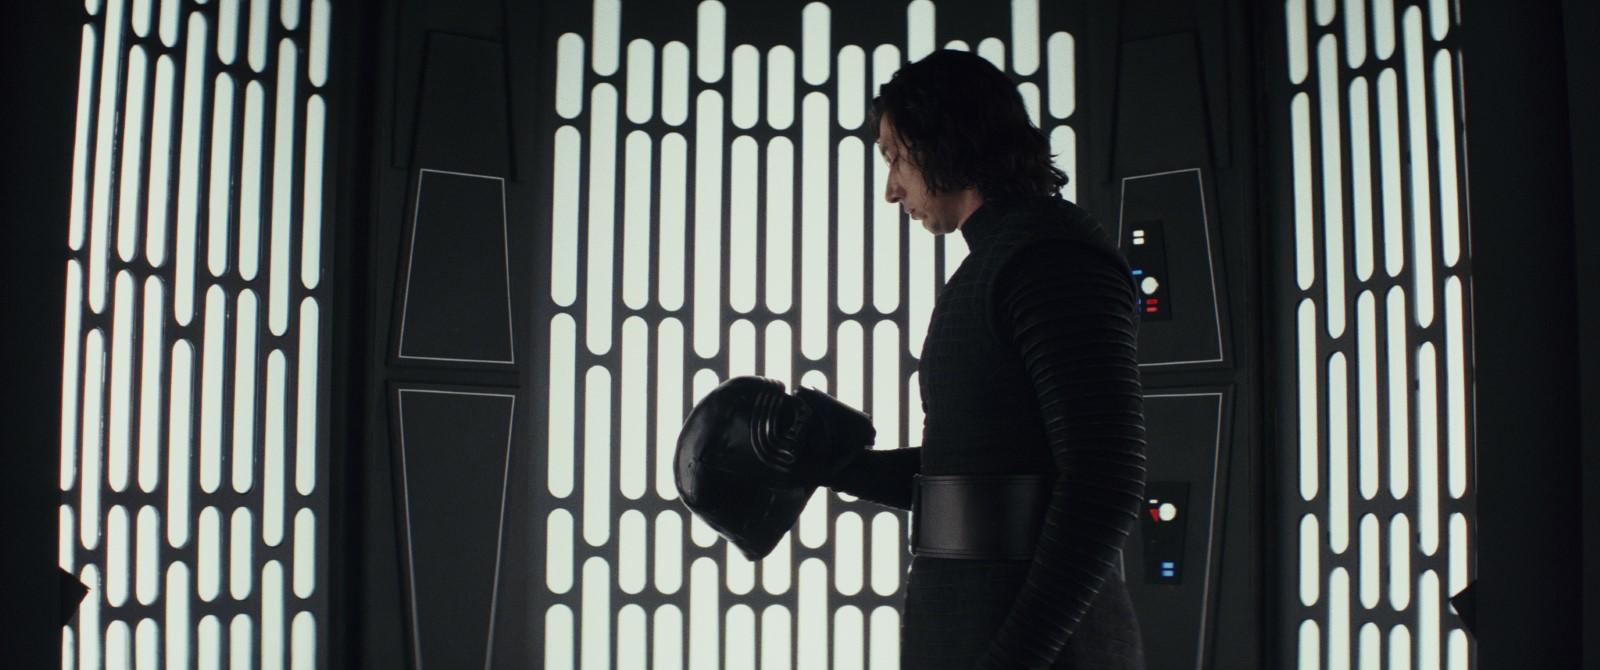 "Adam Driver dans ""Star Wars - Les derniers Jedi"" (2017) de Rian Johnson."